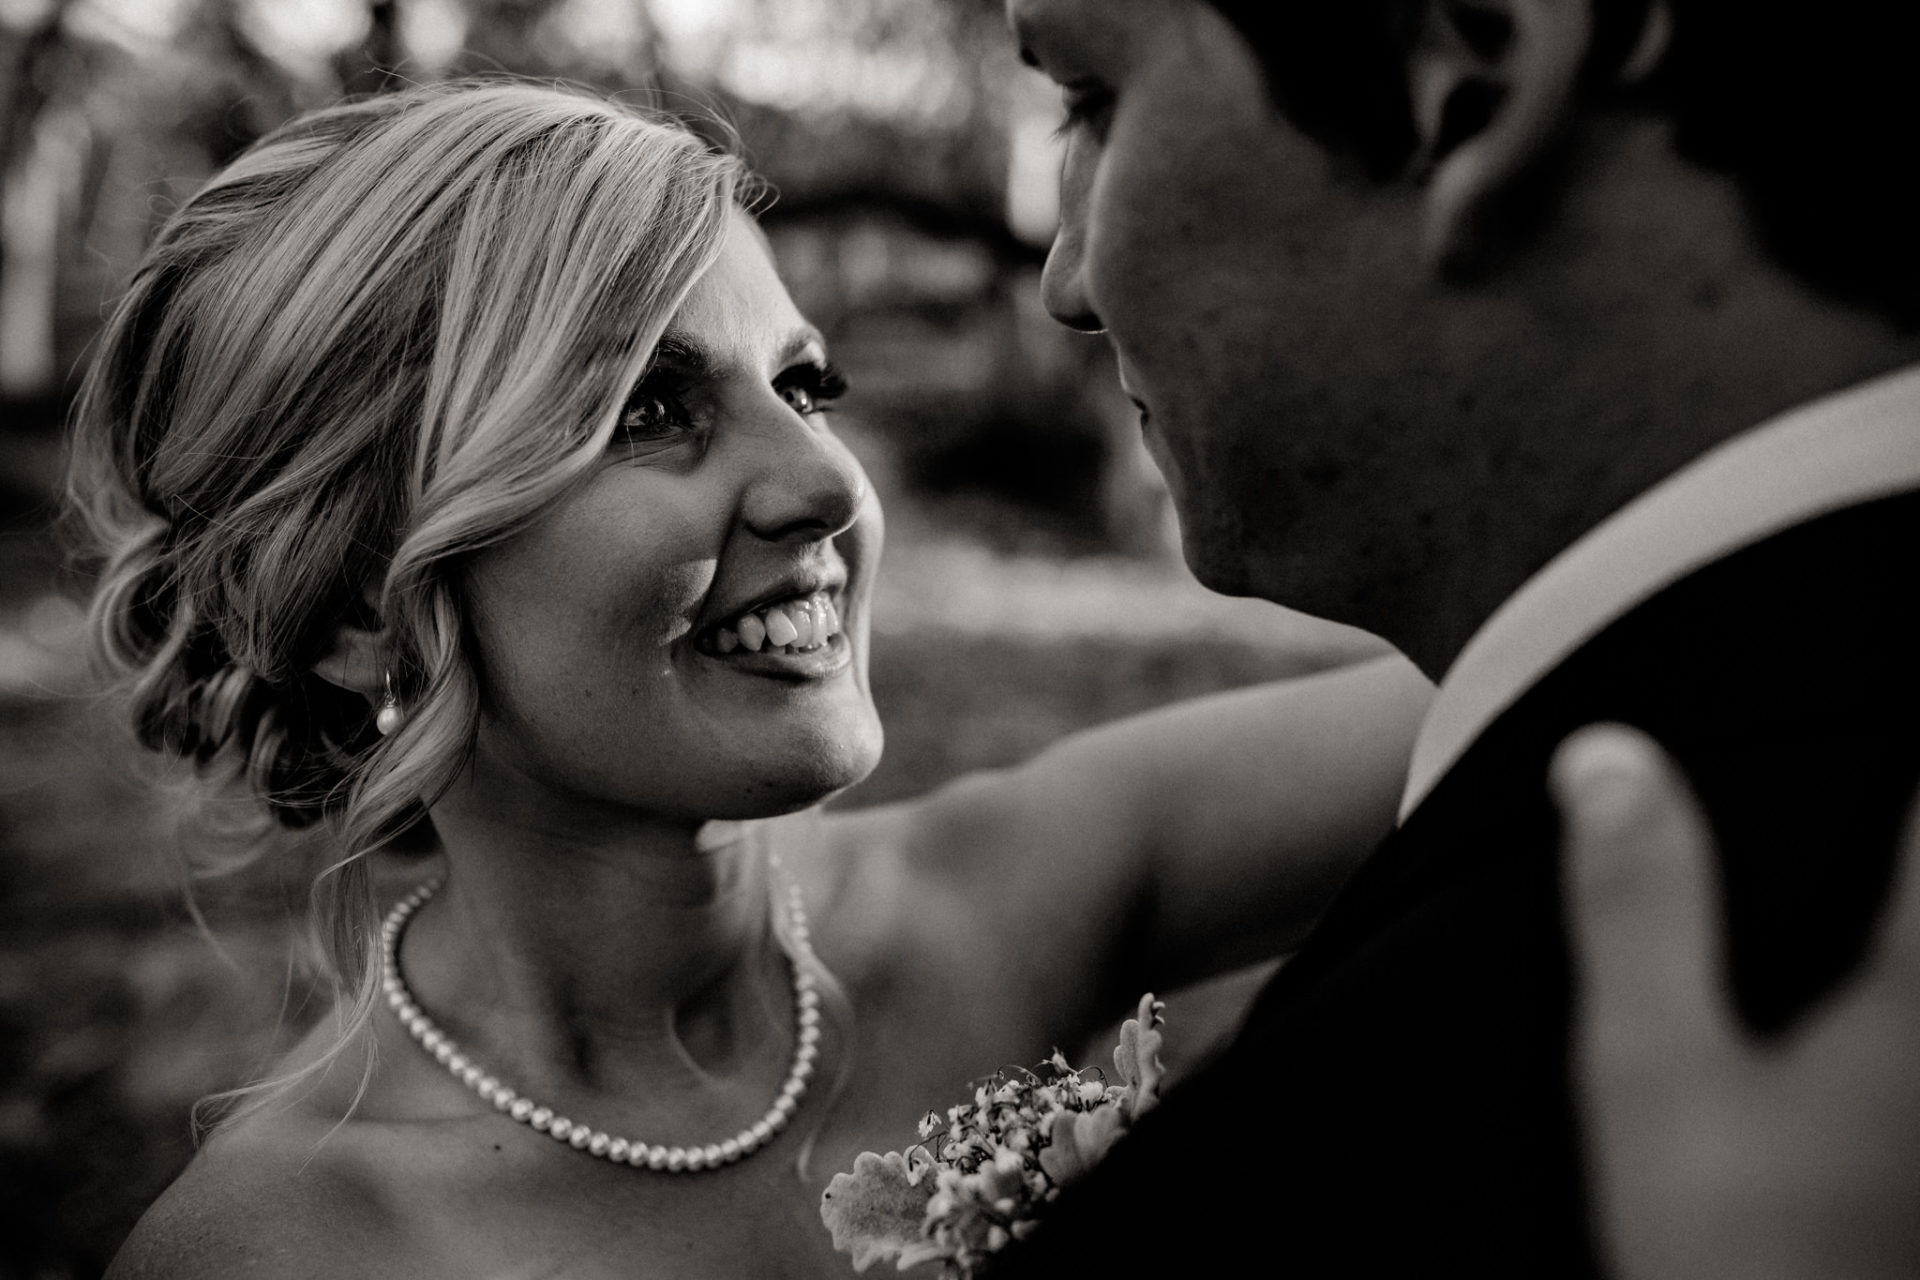 backyard-wedding-australia-melbourne-bride-groom-portrait-black-and-white